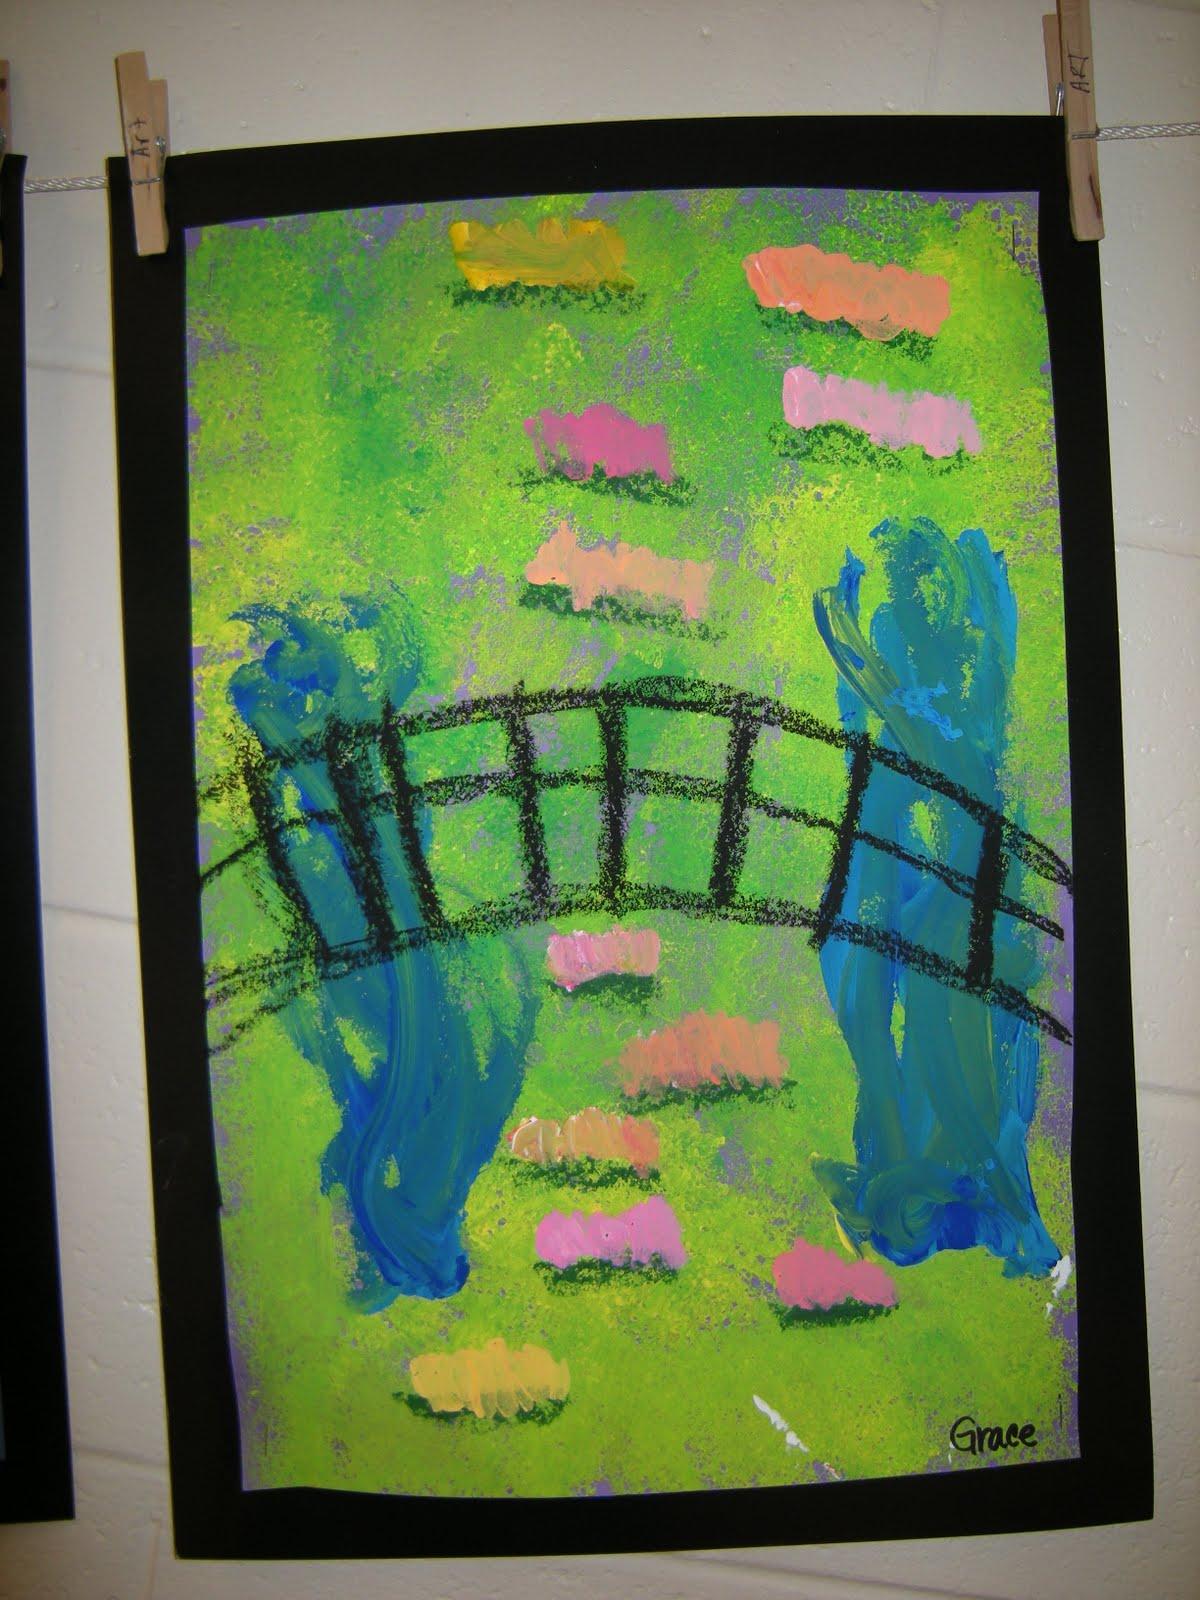 Tart Teaching Art With Attitude Magical Water Garden Of